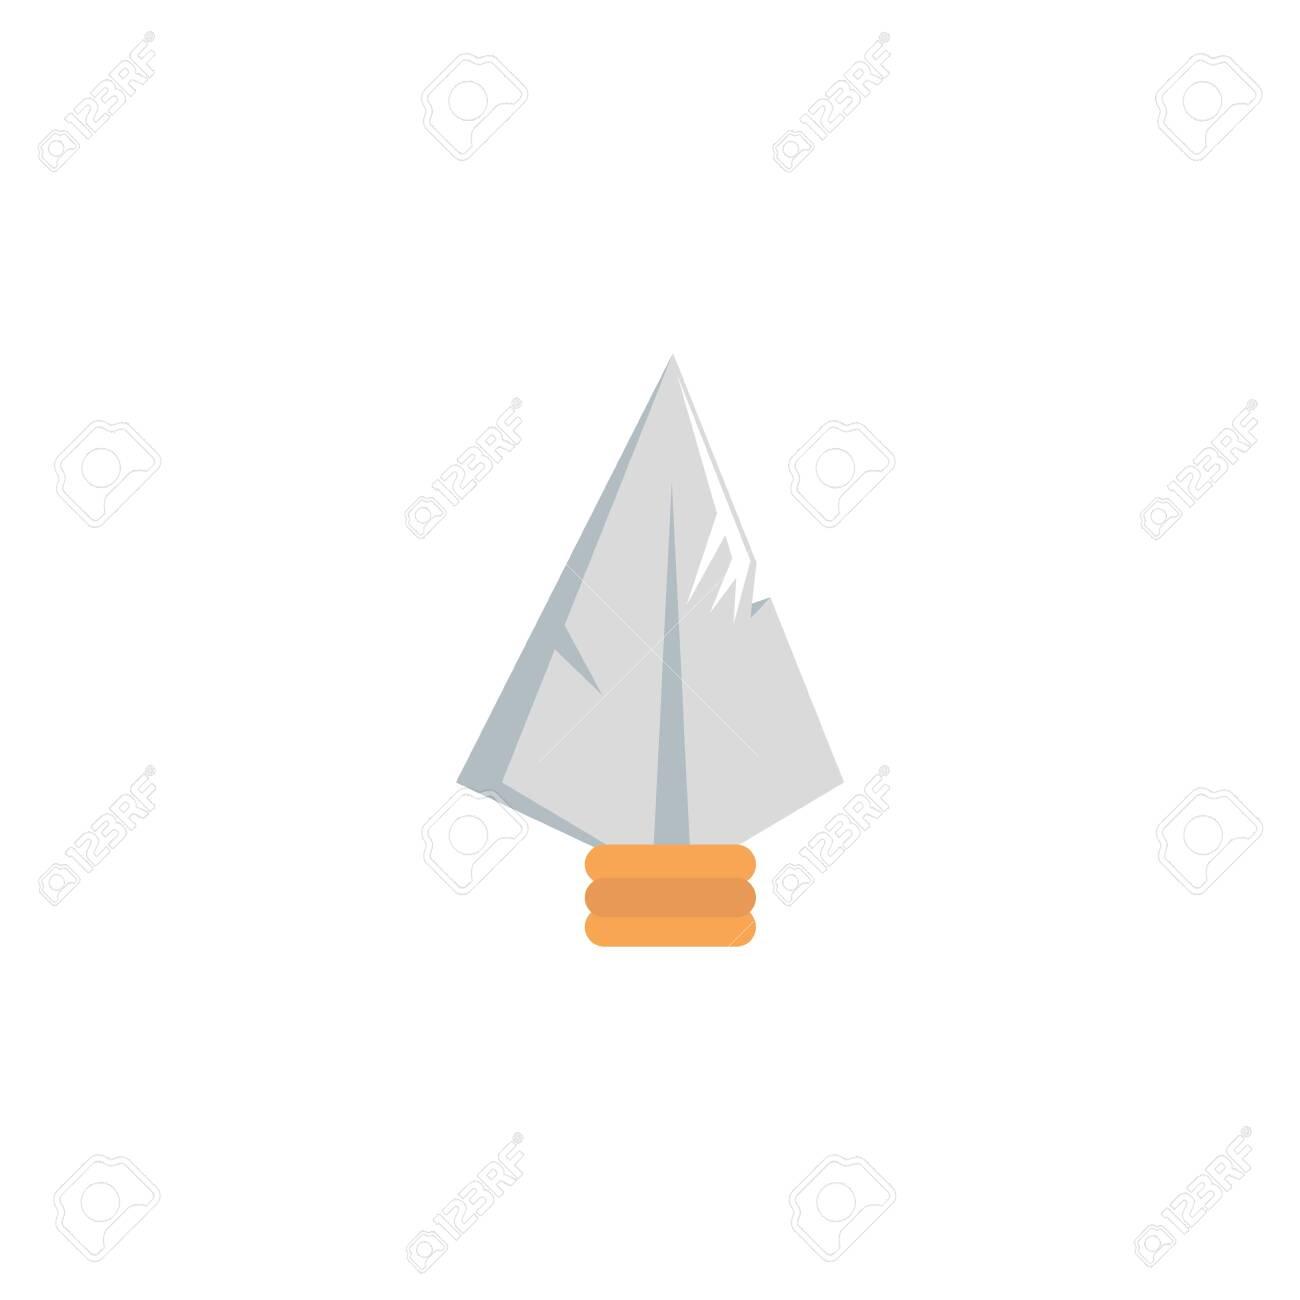 fairytale spearhead fantastic isolated icon vector illustration design - 133849472